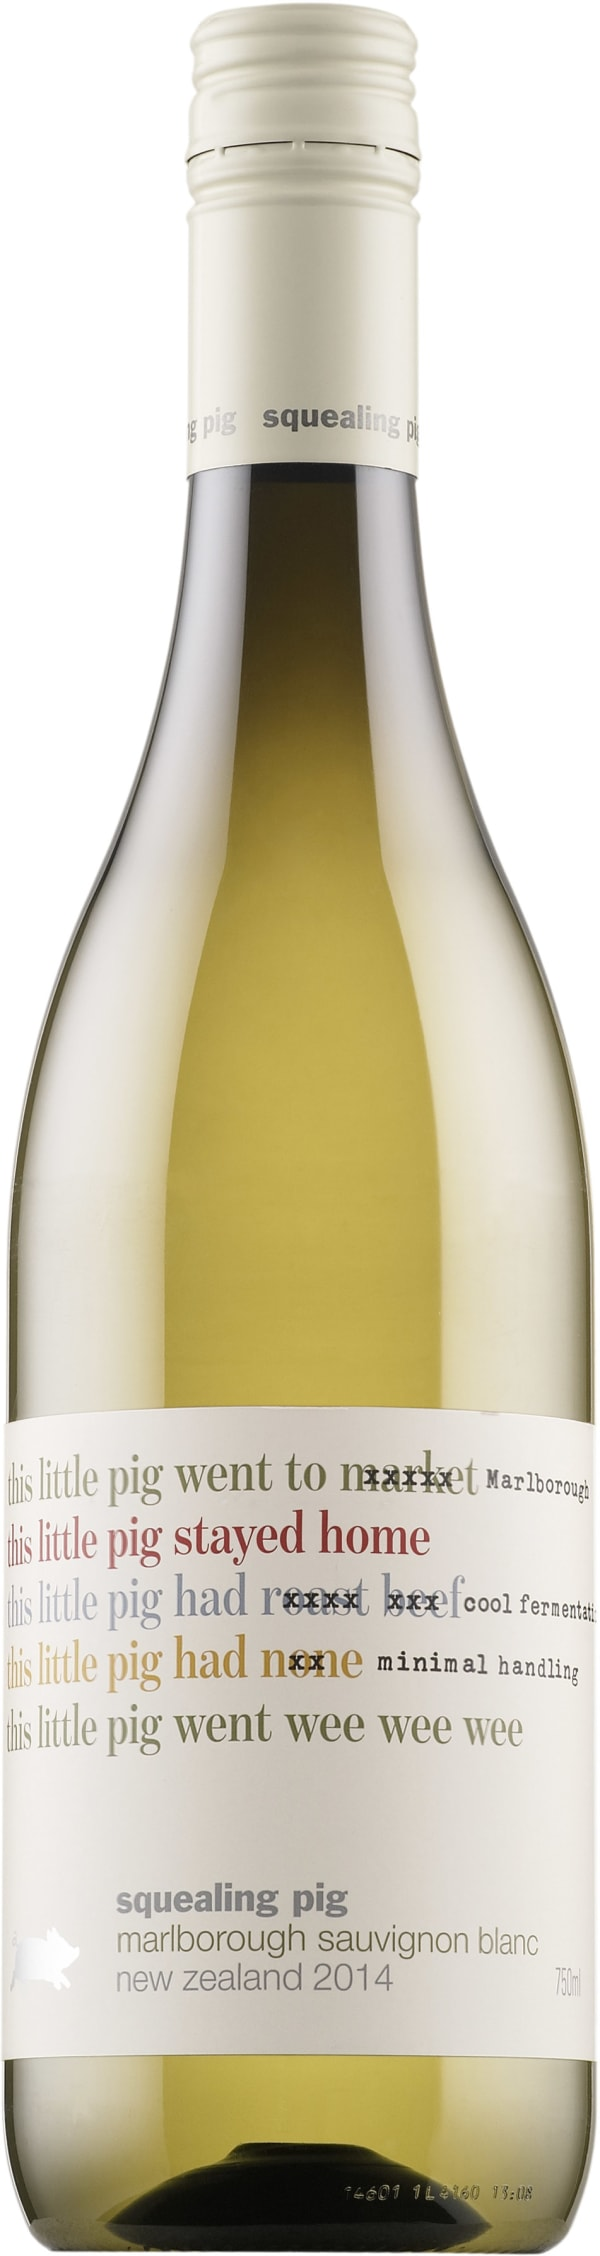 Squealing Pig Sauvignon Blanc 2016 plastic bottle